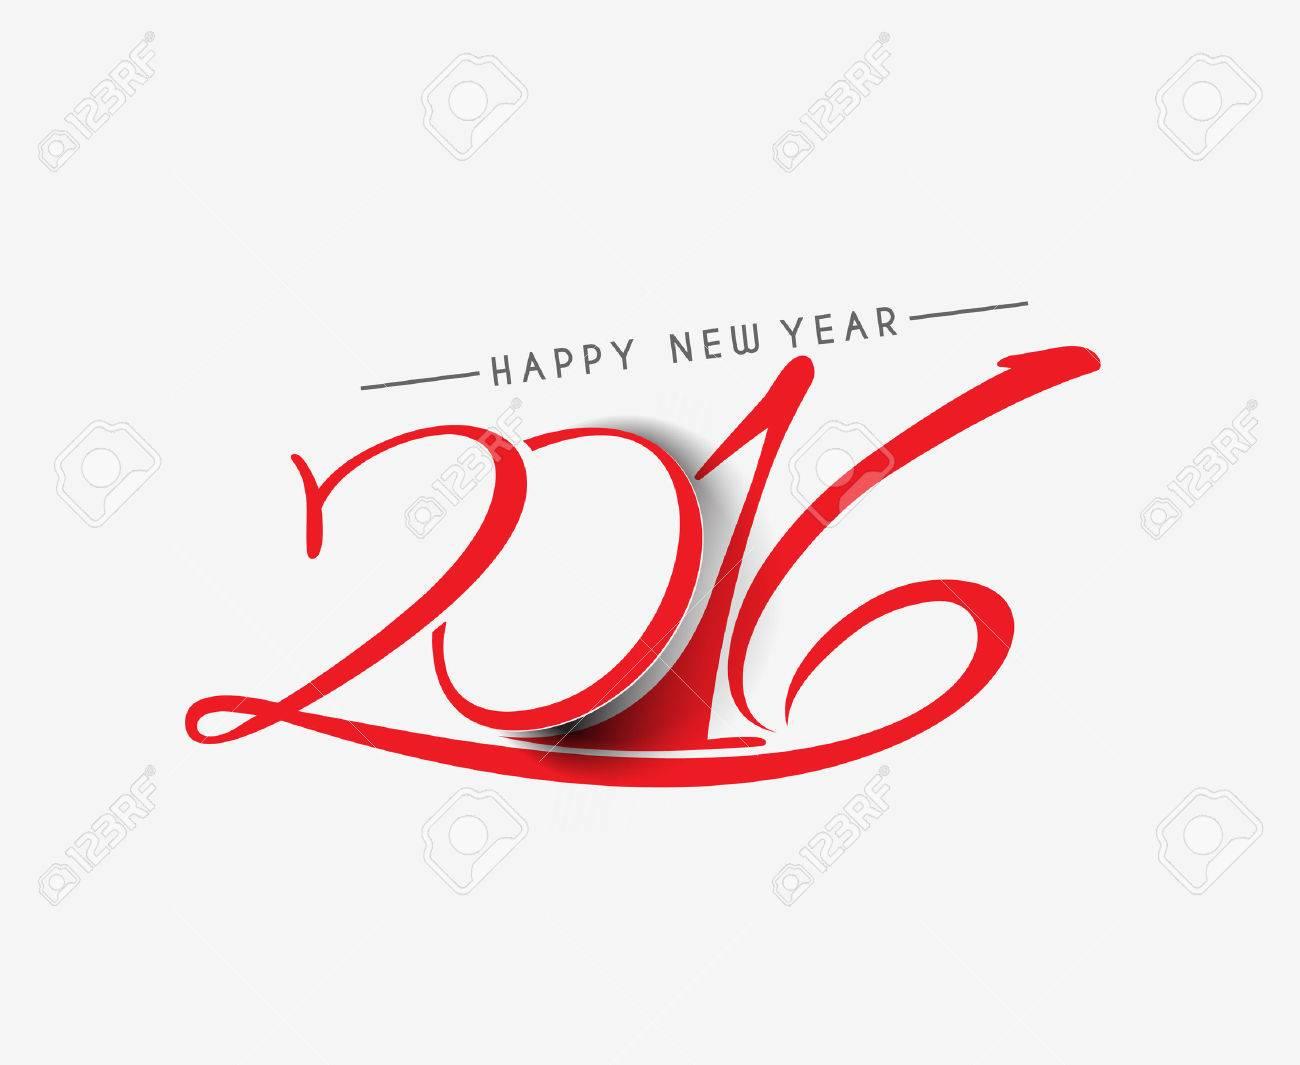 Happy new year 2016 Text Design - 47383346